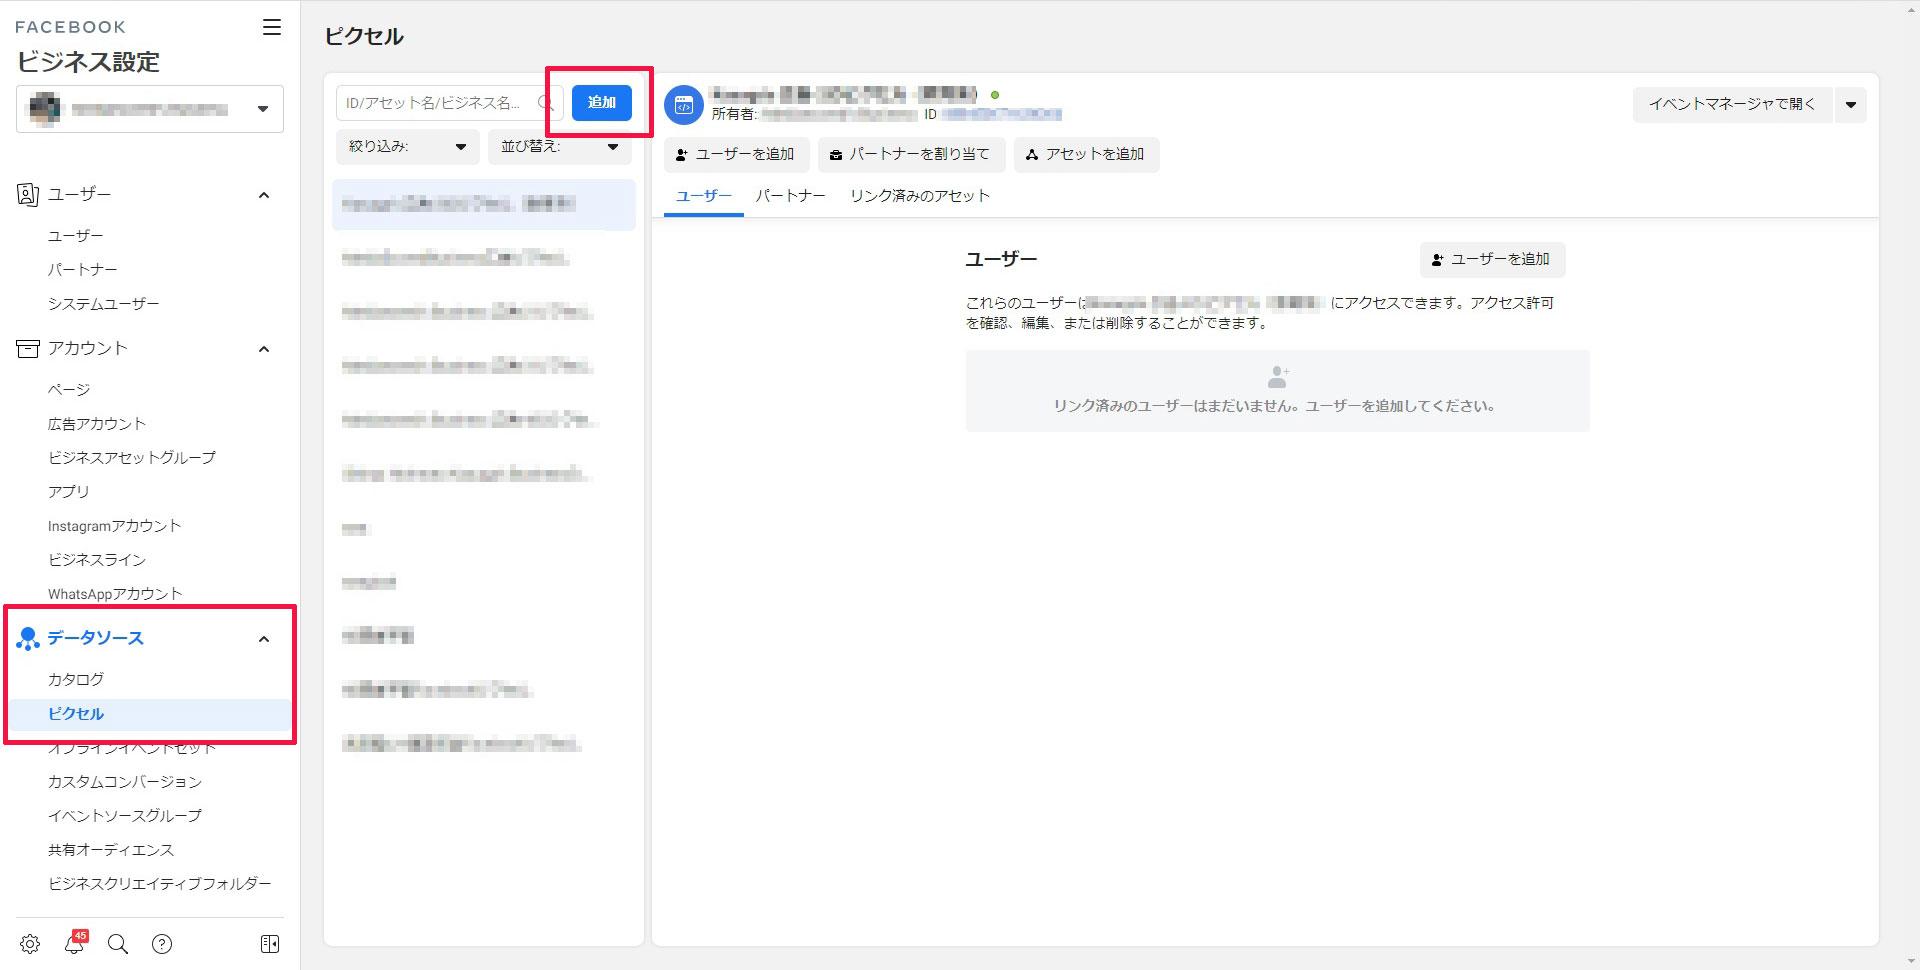 Facebookデータソース画面